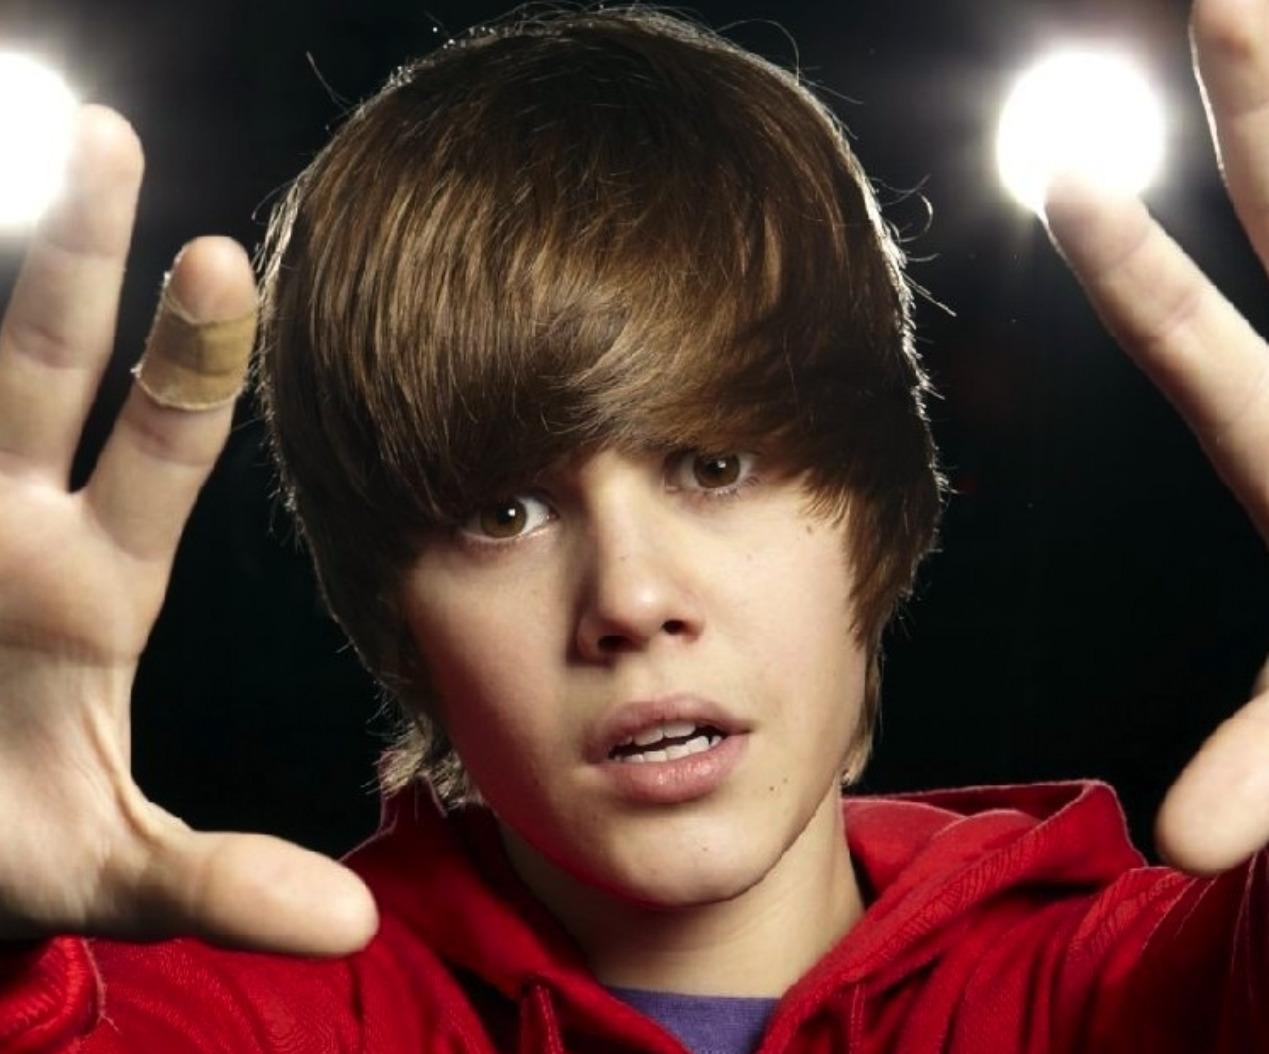 Believe Tour - Justin Bieber picha (32675476) - fanpop